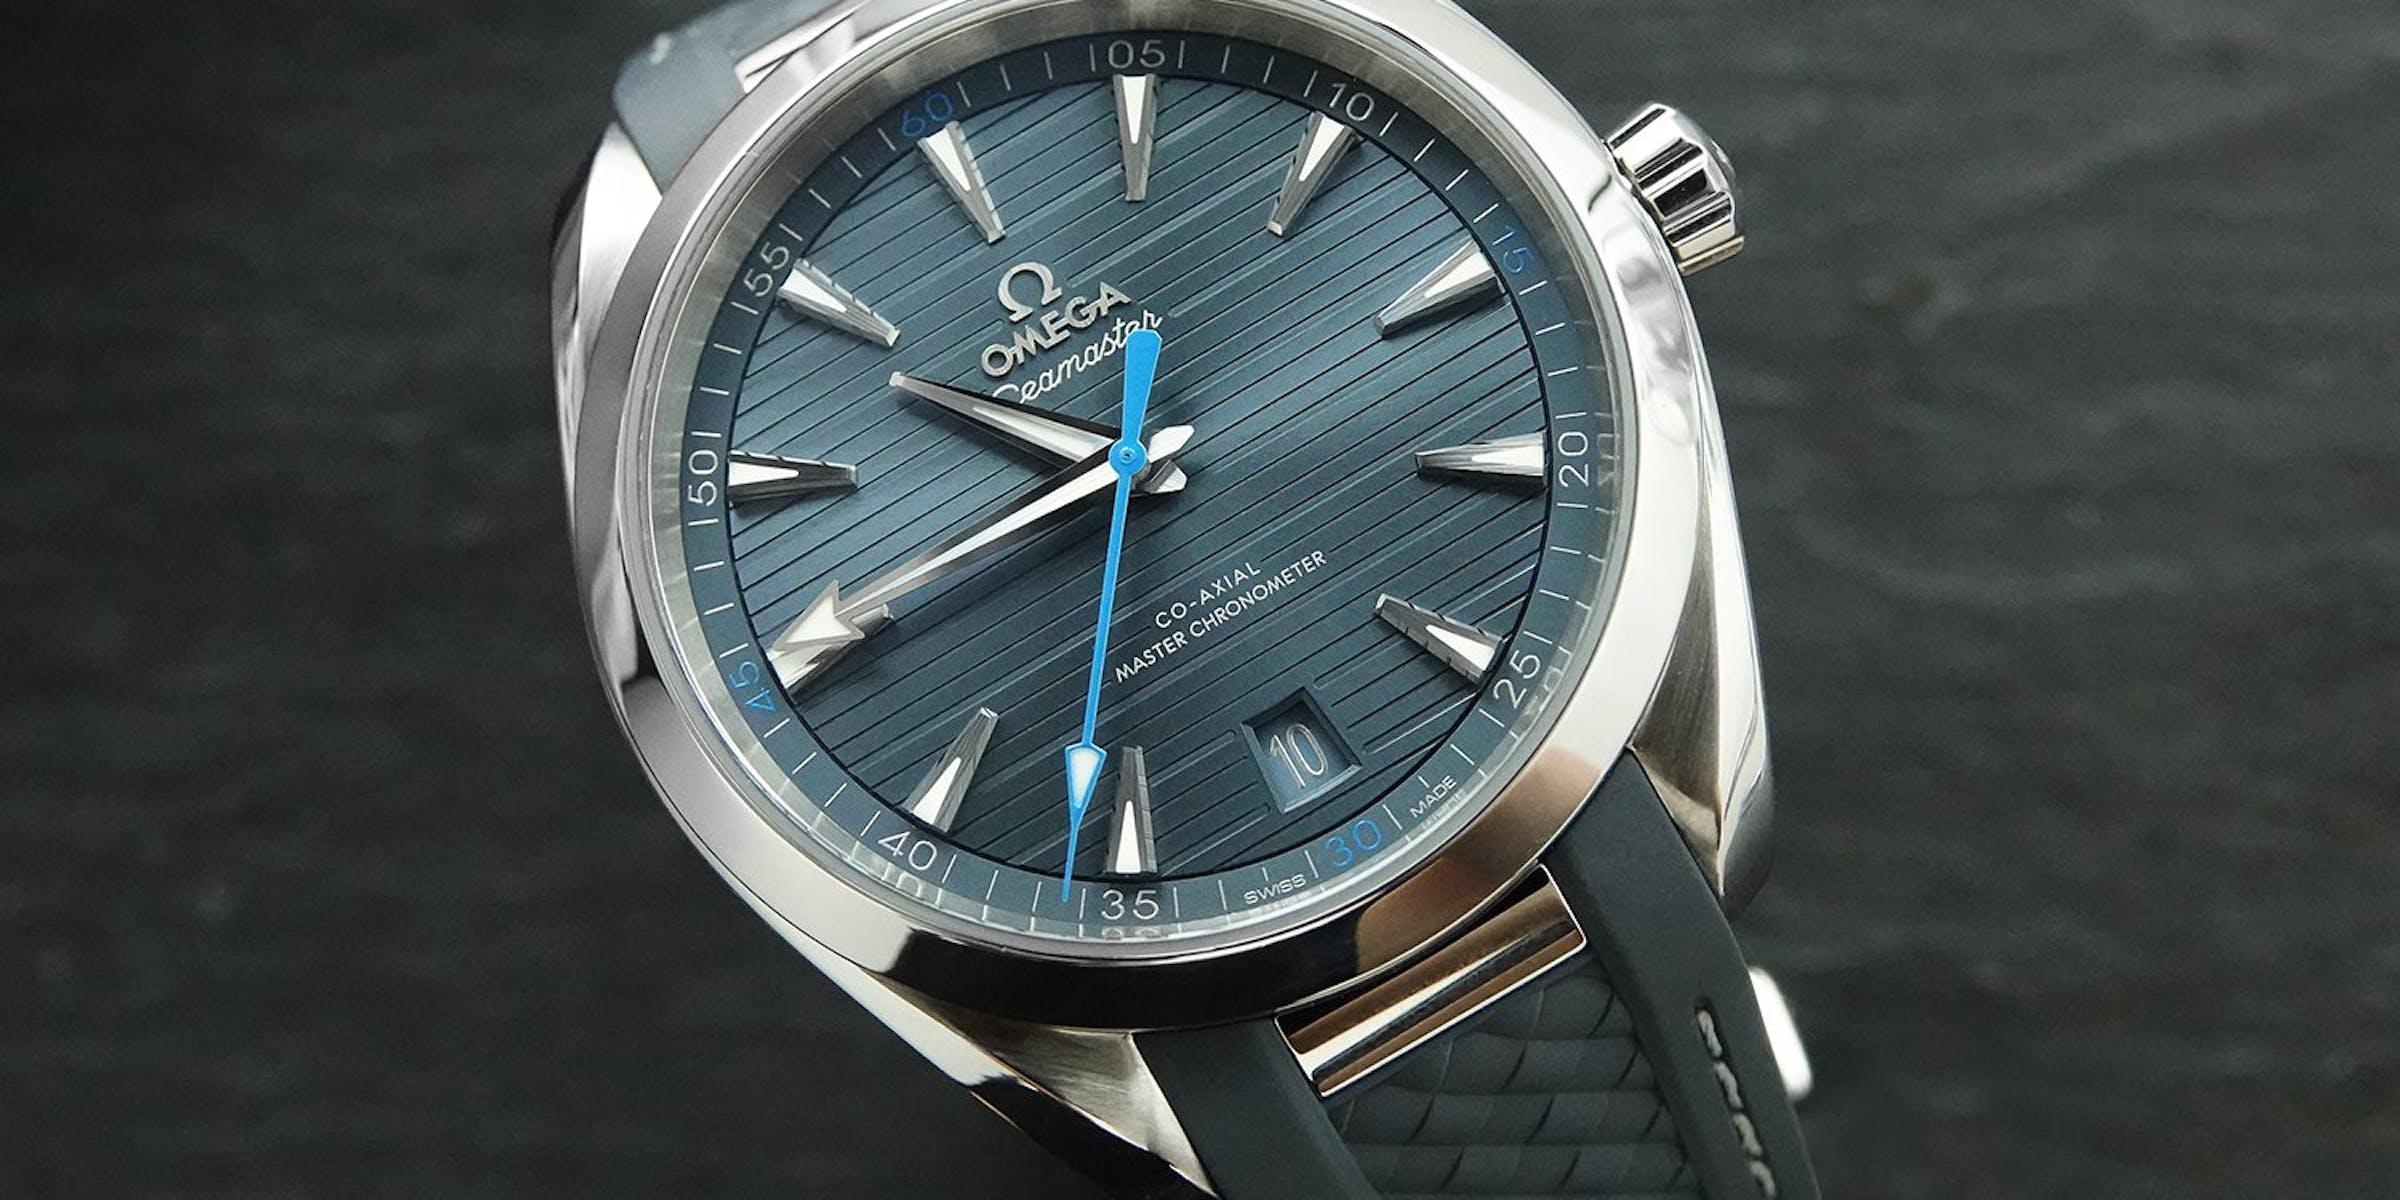 CAM-1379-Videoartikel-Rolex-Aqua-Terra-Magazin-2-1